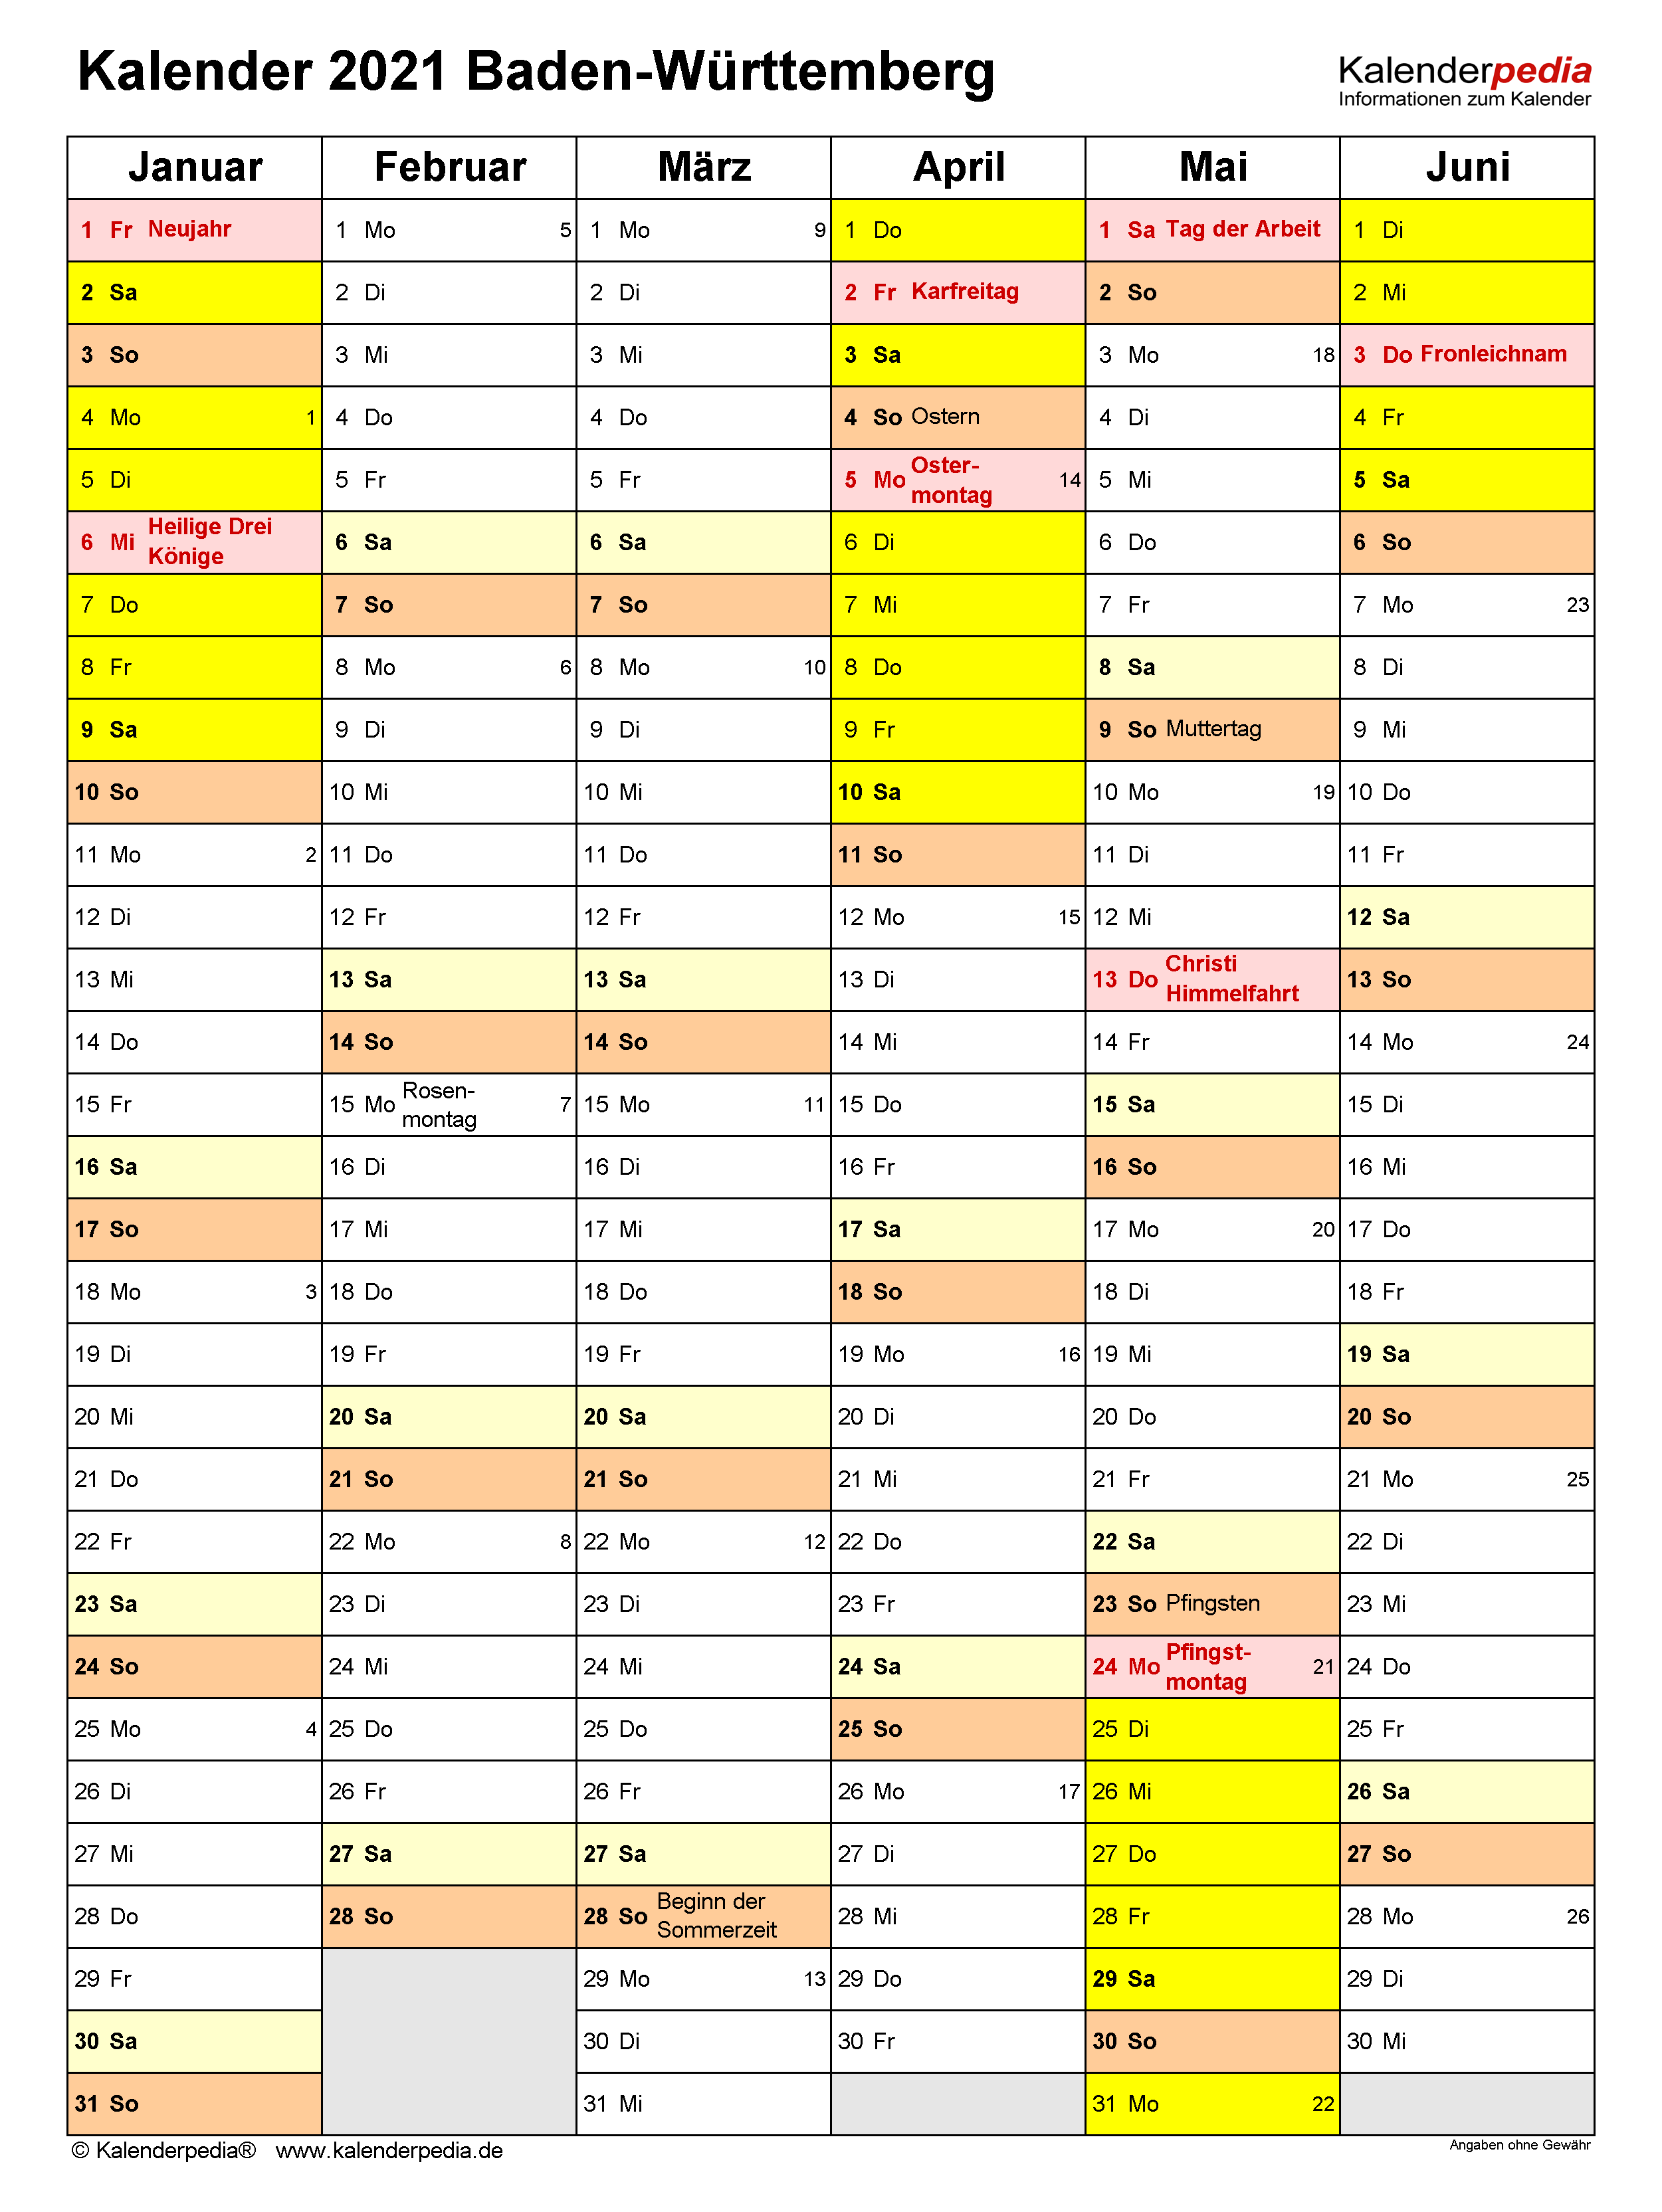 Kalender 2021 Baden-Württemberg: Ferien, Feiertage, PDF ...